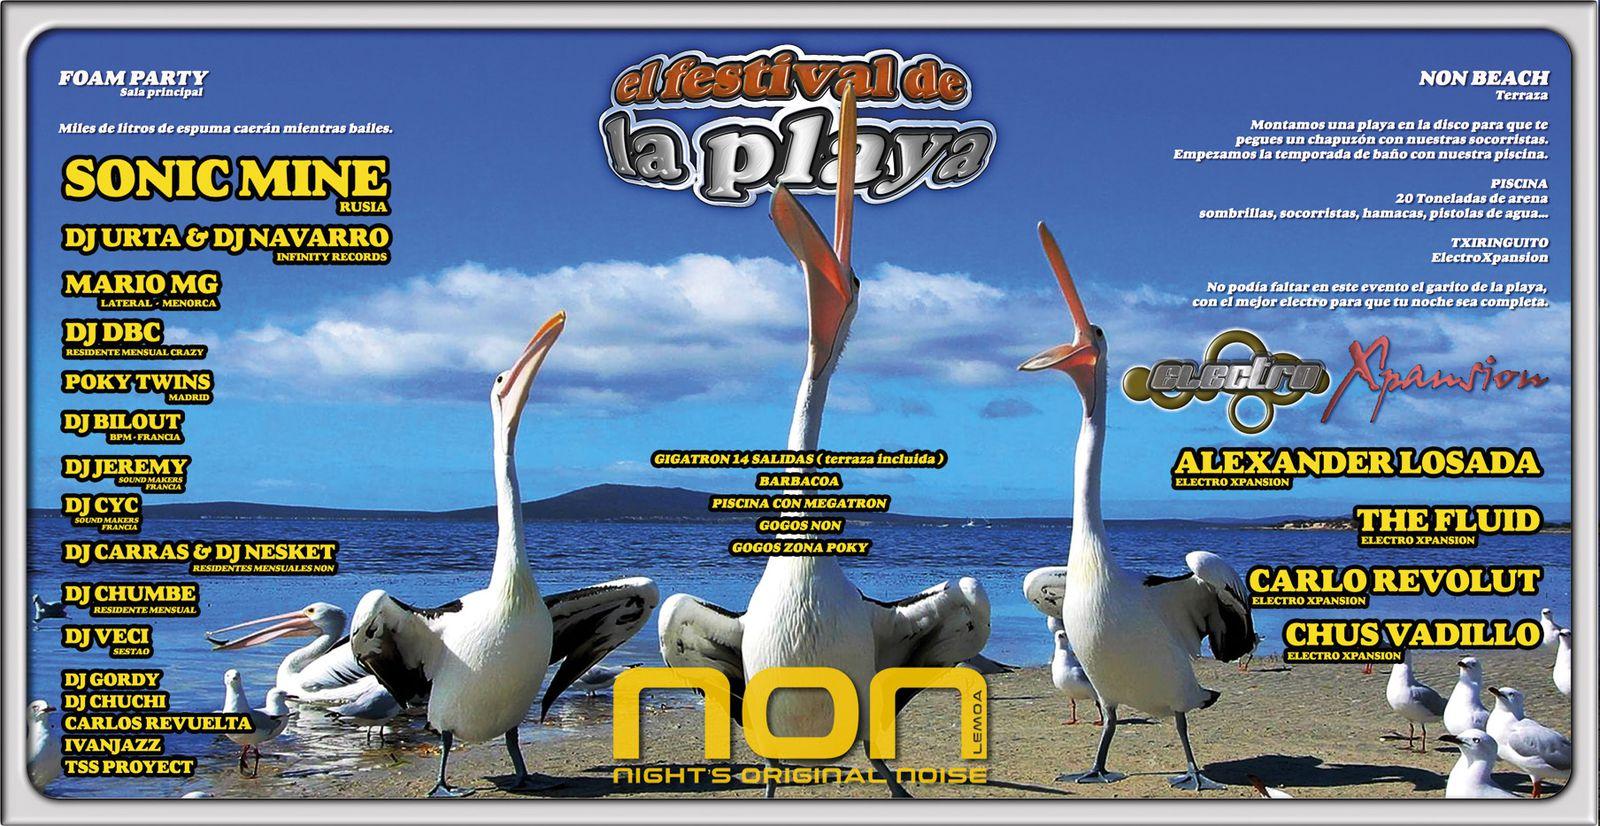 CyC &amp&#x3B; Jeremy (Sound Makers) @ El Festival de la playa (NON/Spain)